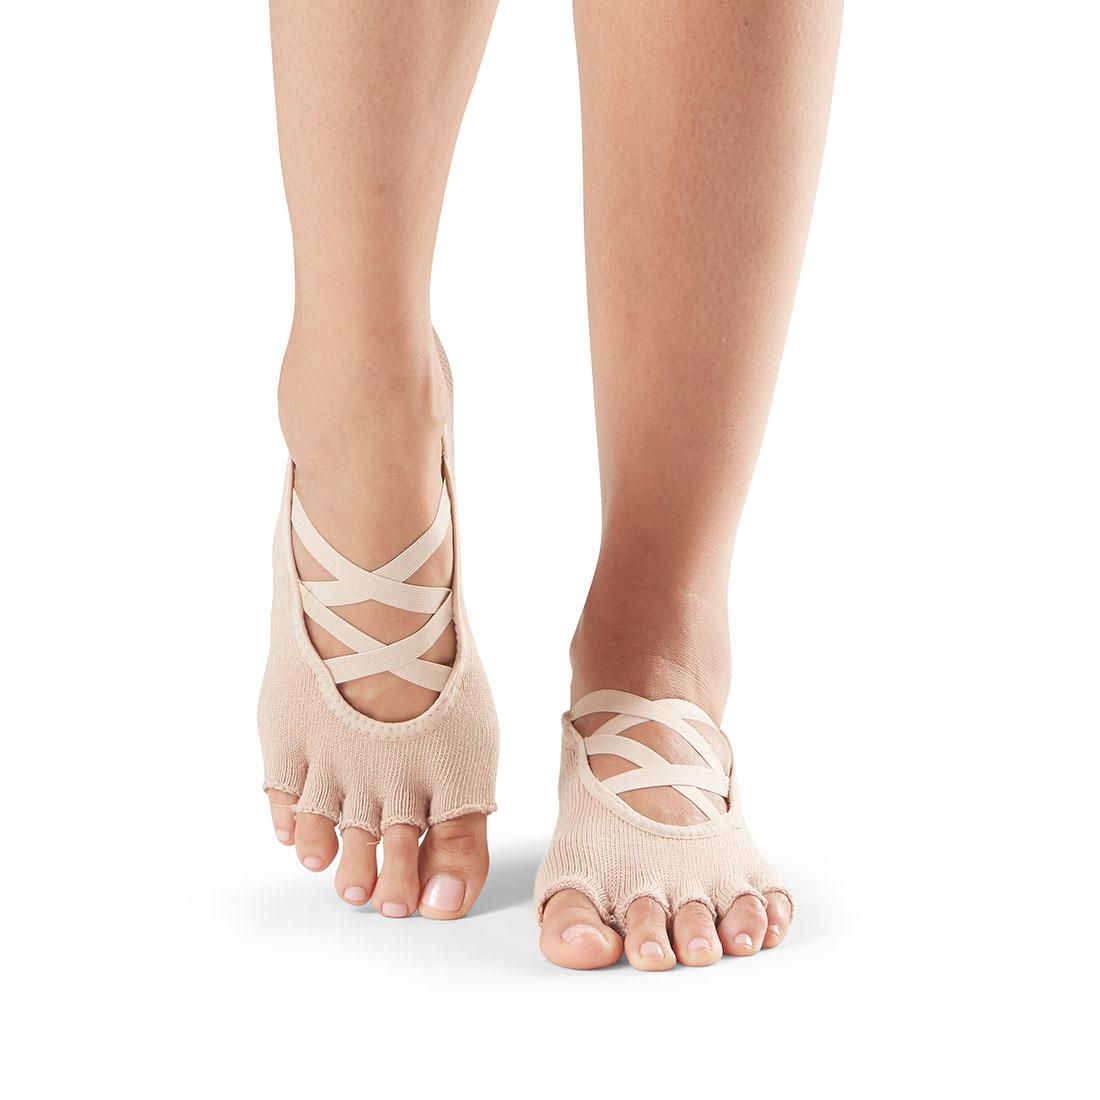 Yogasocken ToeSox Elle Half Toe Nude - 1